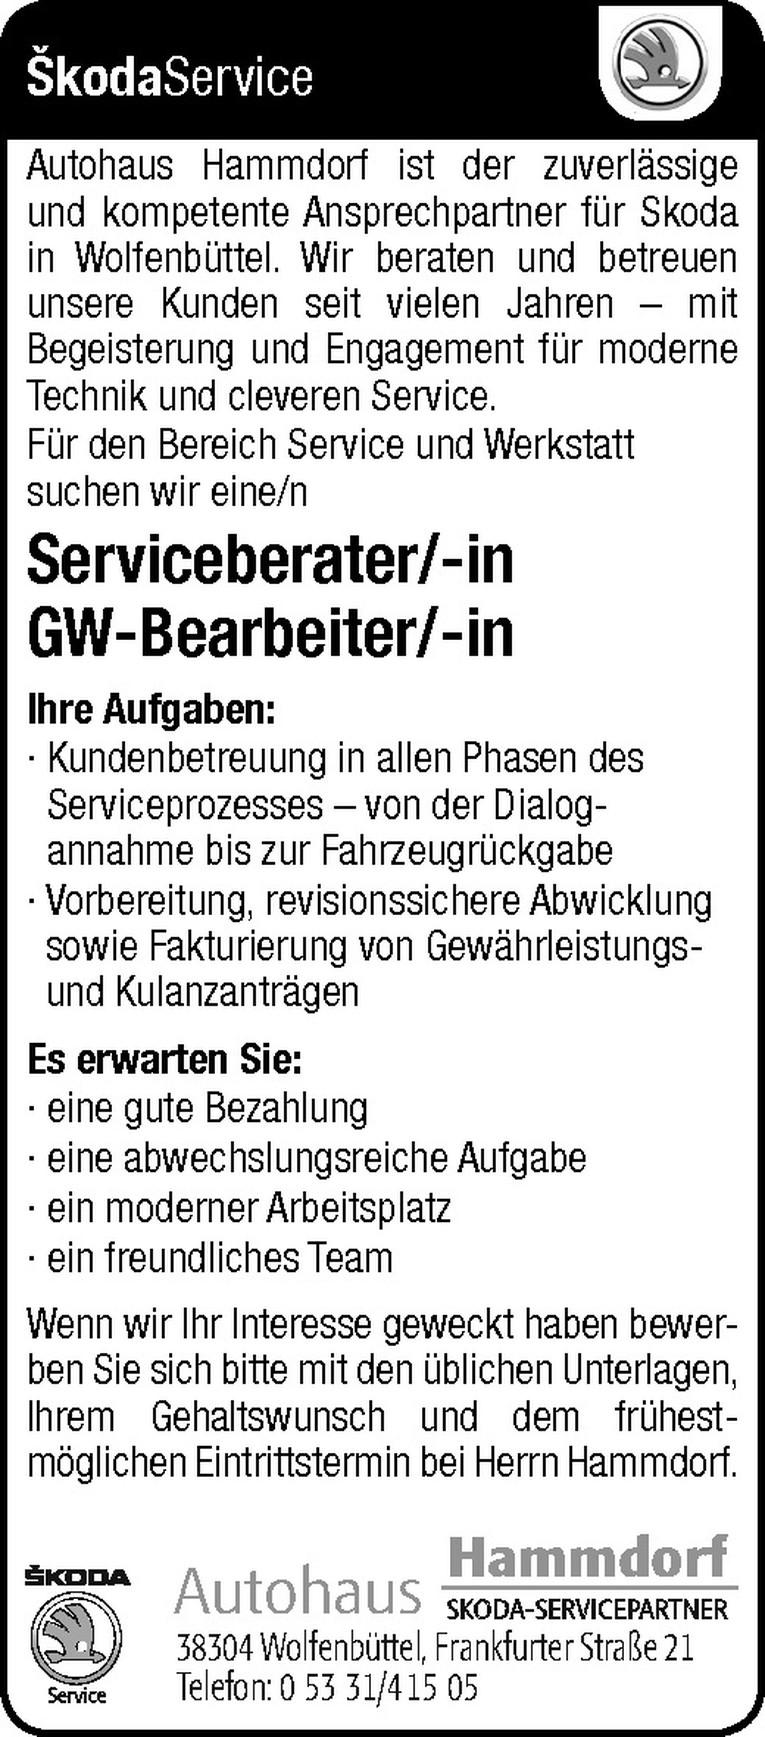 Serviceberater/GW-Bearbeiter (m/w)